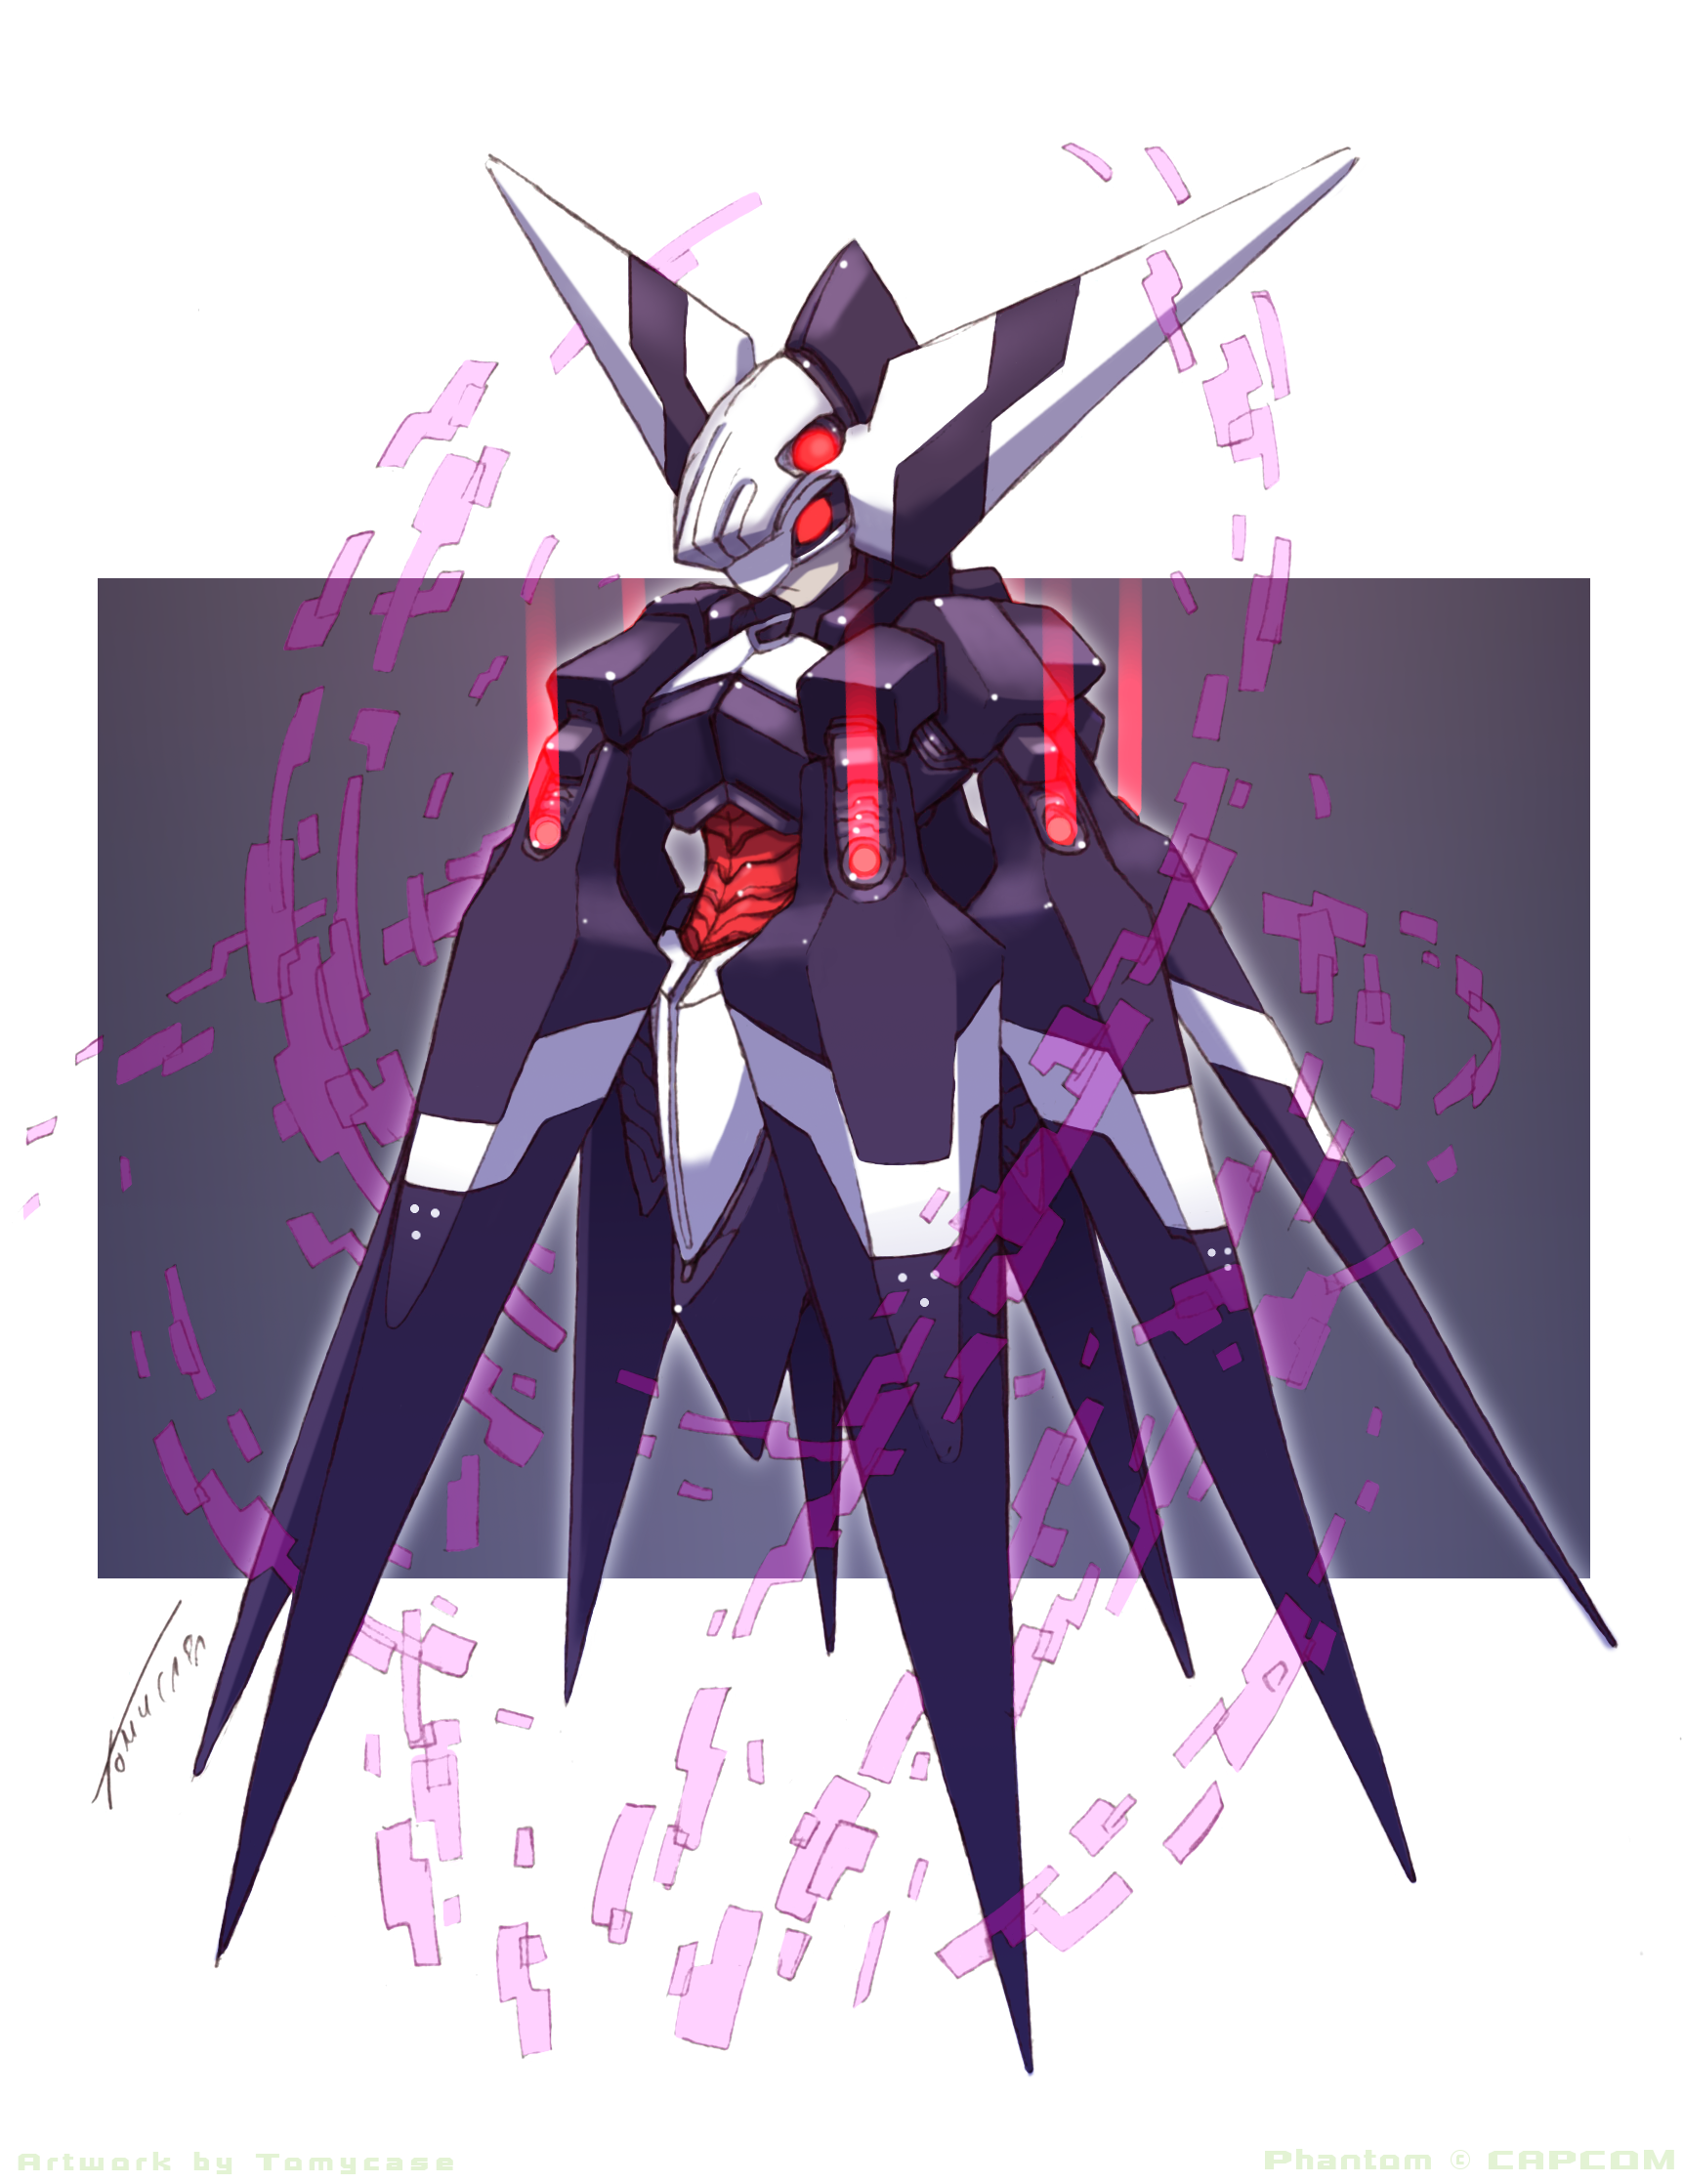 Phantom Armed Phenomenon